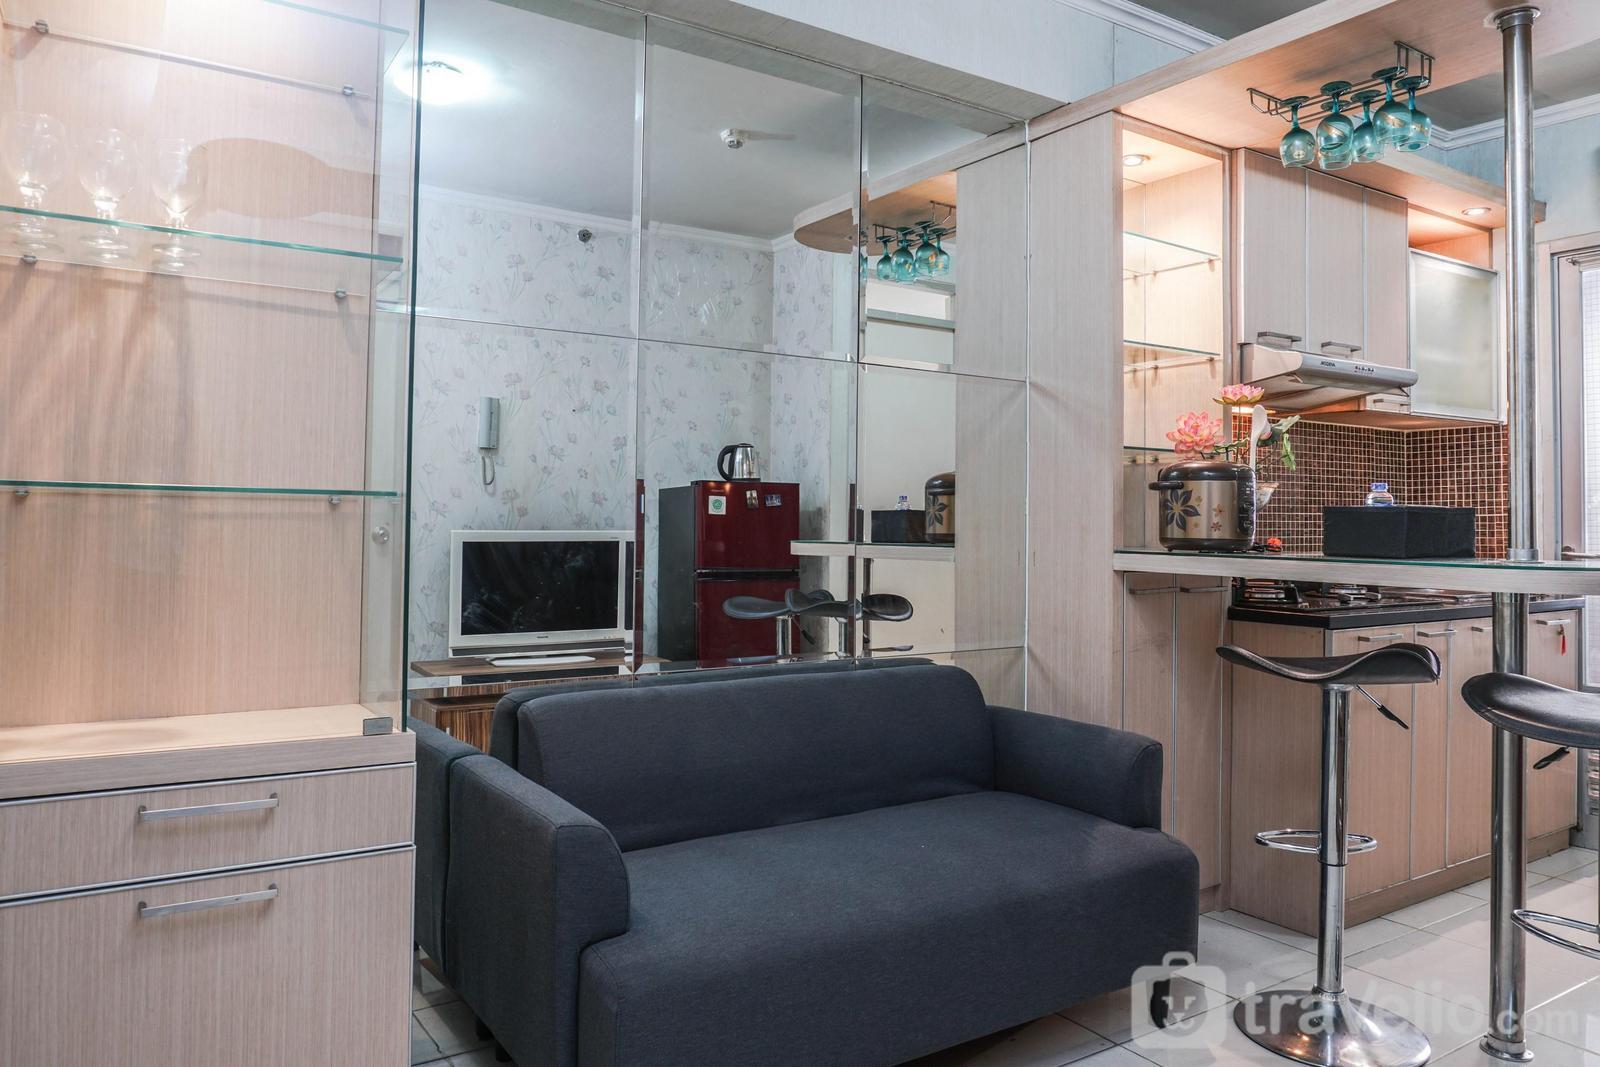 Gading Nias Residence - Minimalist Emerald 2BR Apartment at Gading Nias Residences By Travelio